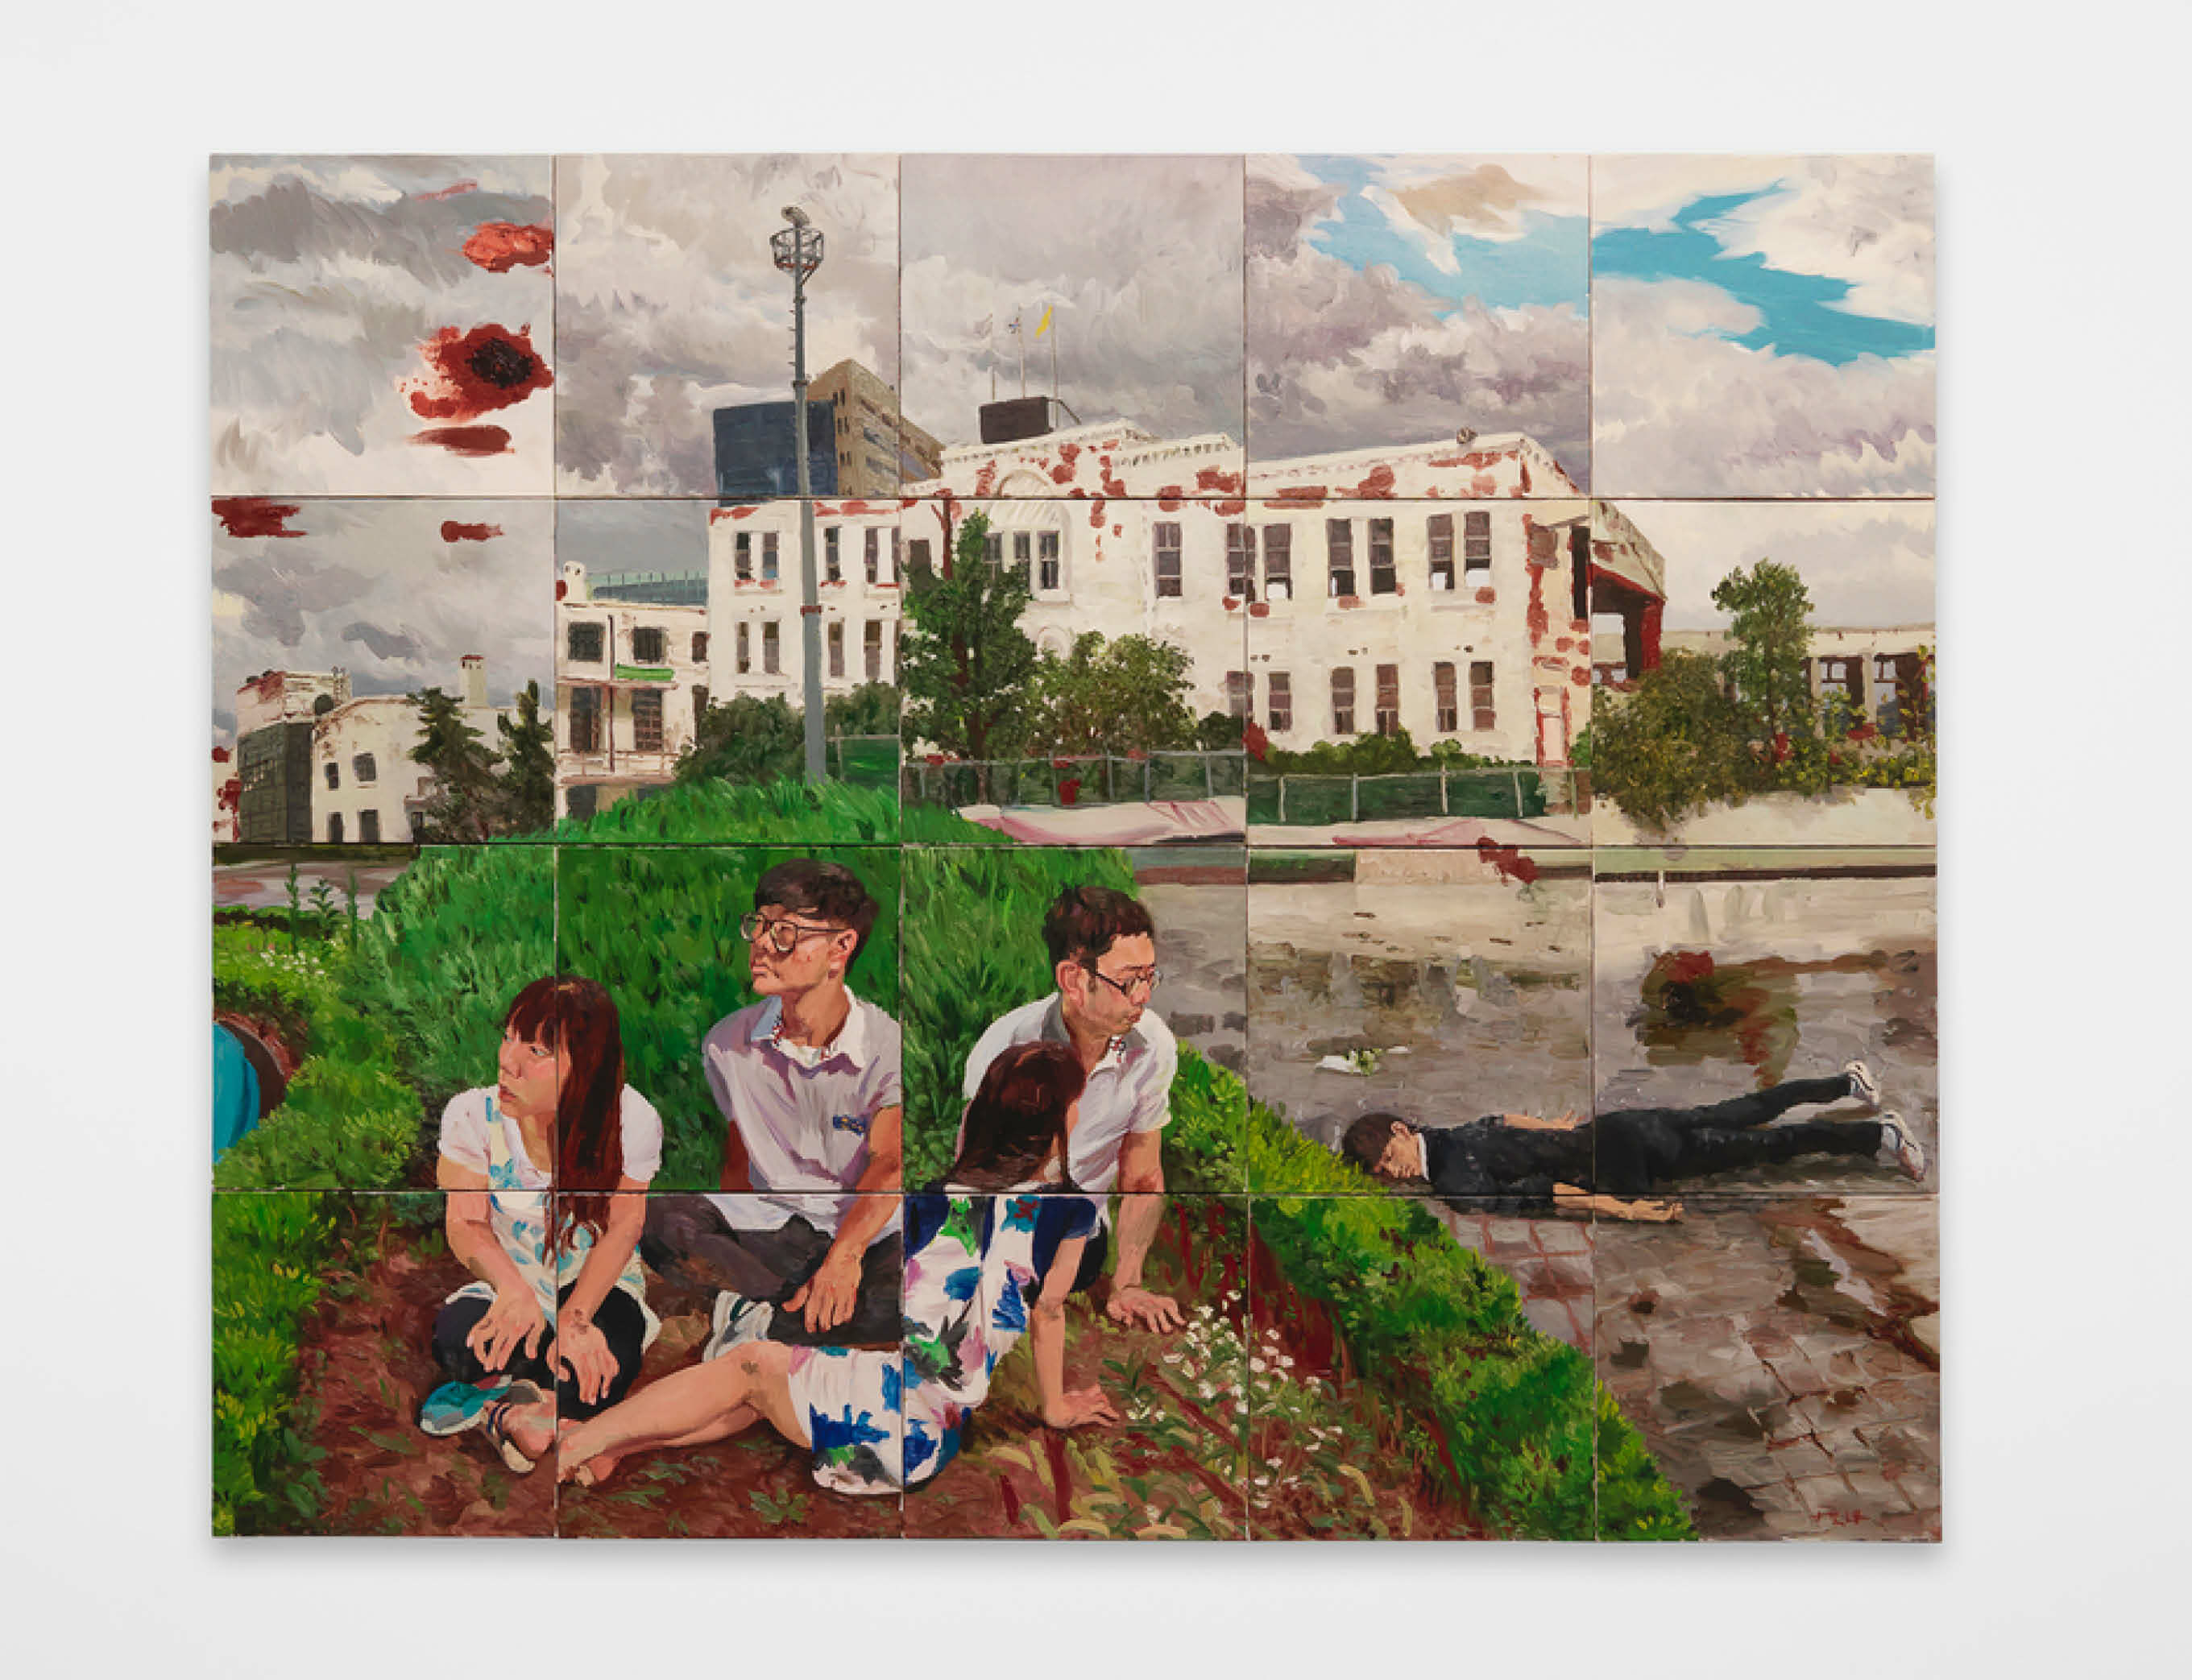 Dhaka Art Summit '18 to include work by Haroon Mirza and Liu Xiaodong